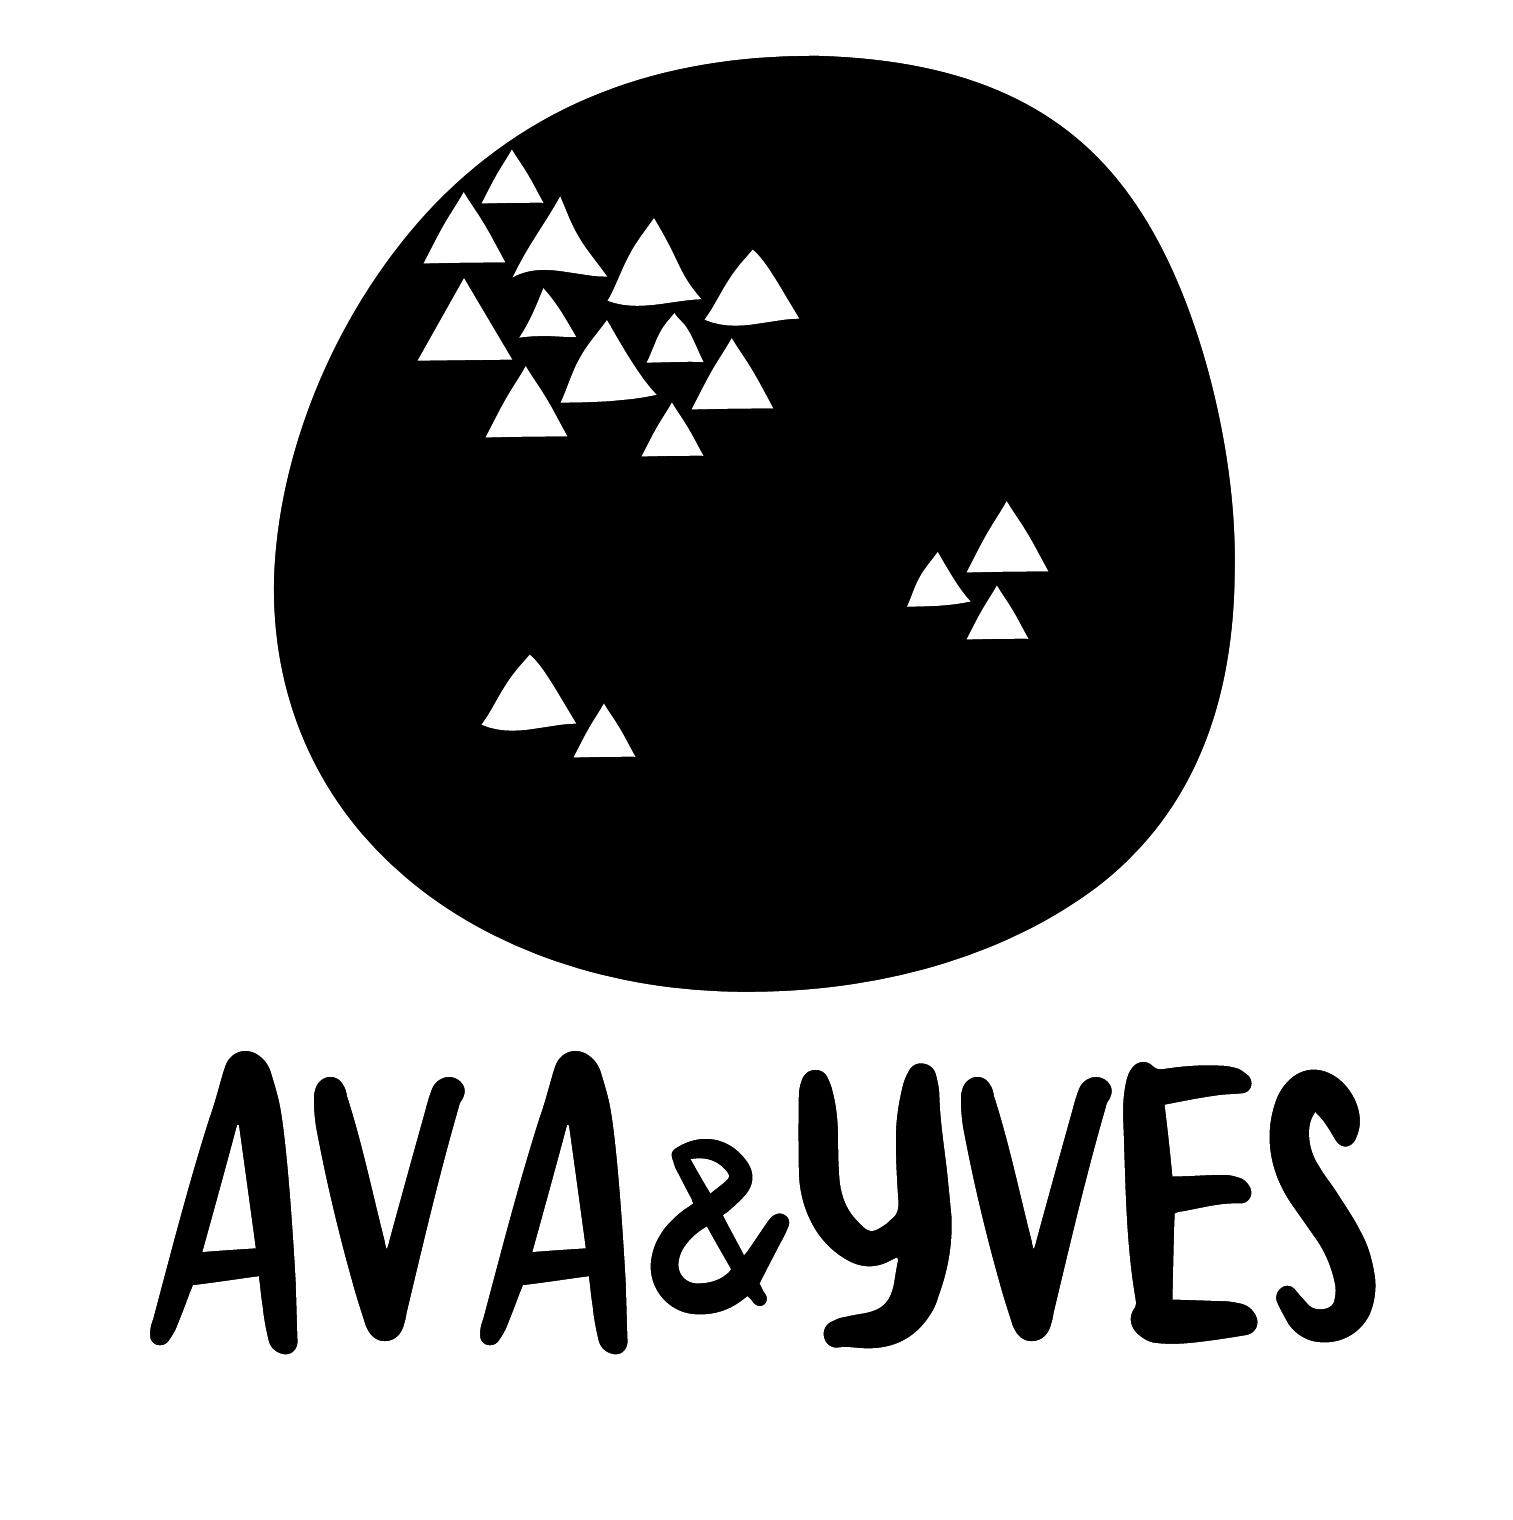 Ava&Yves